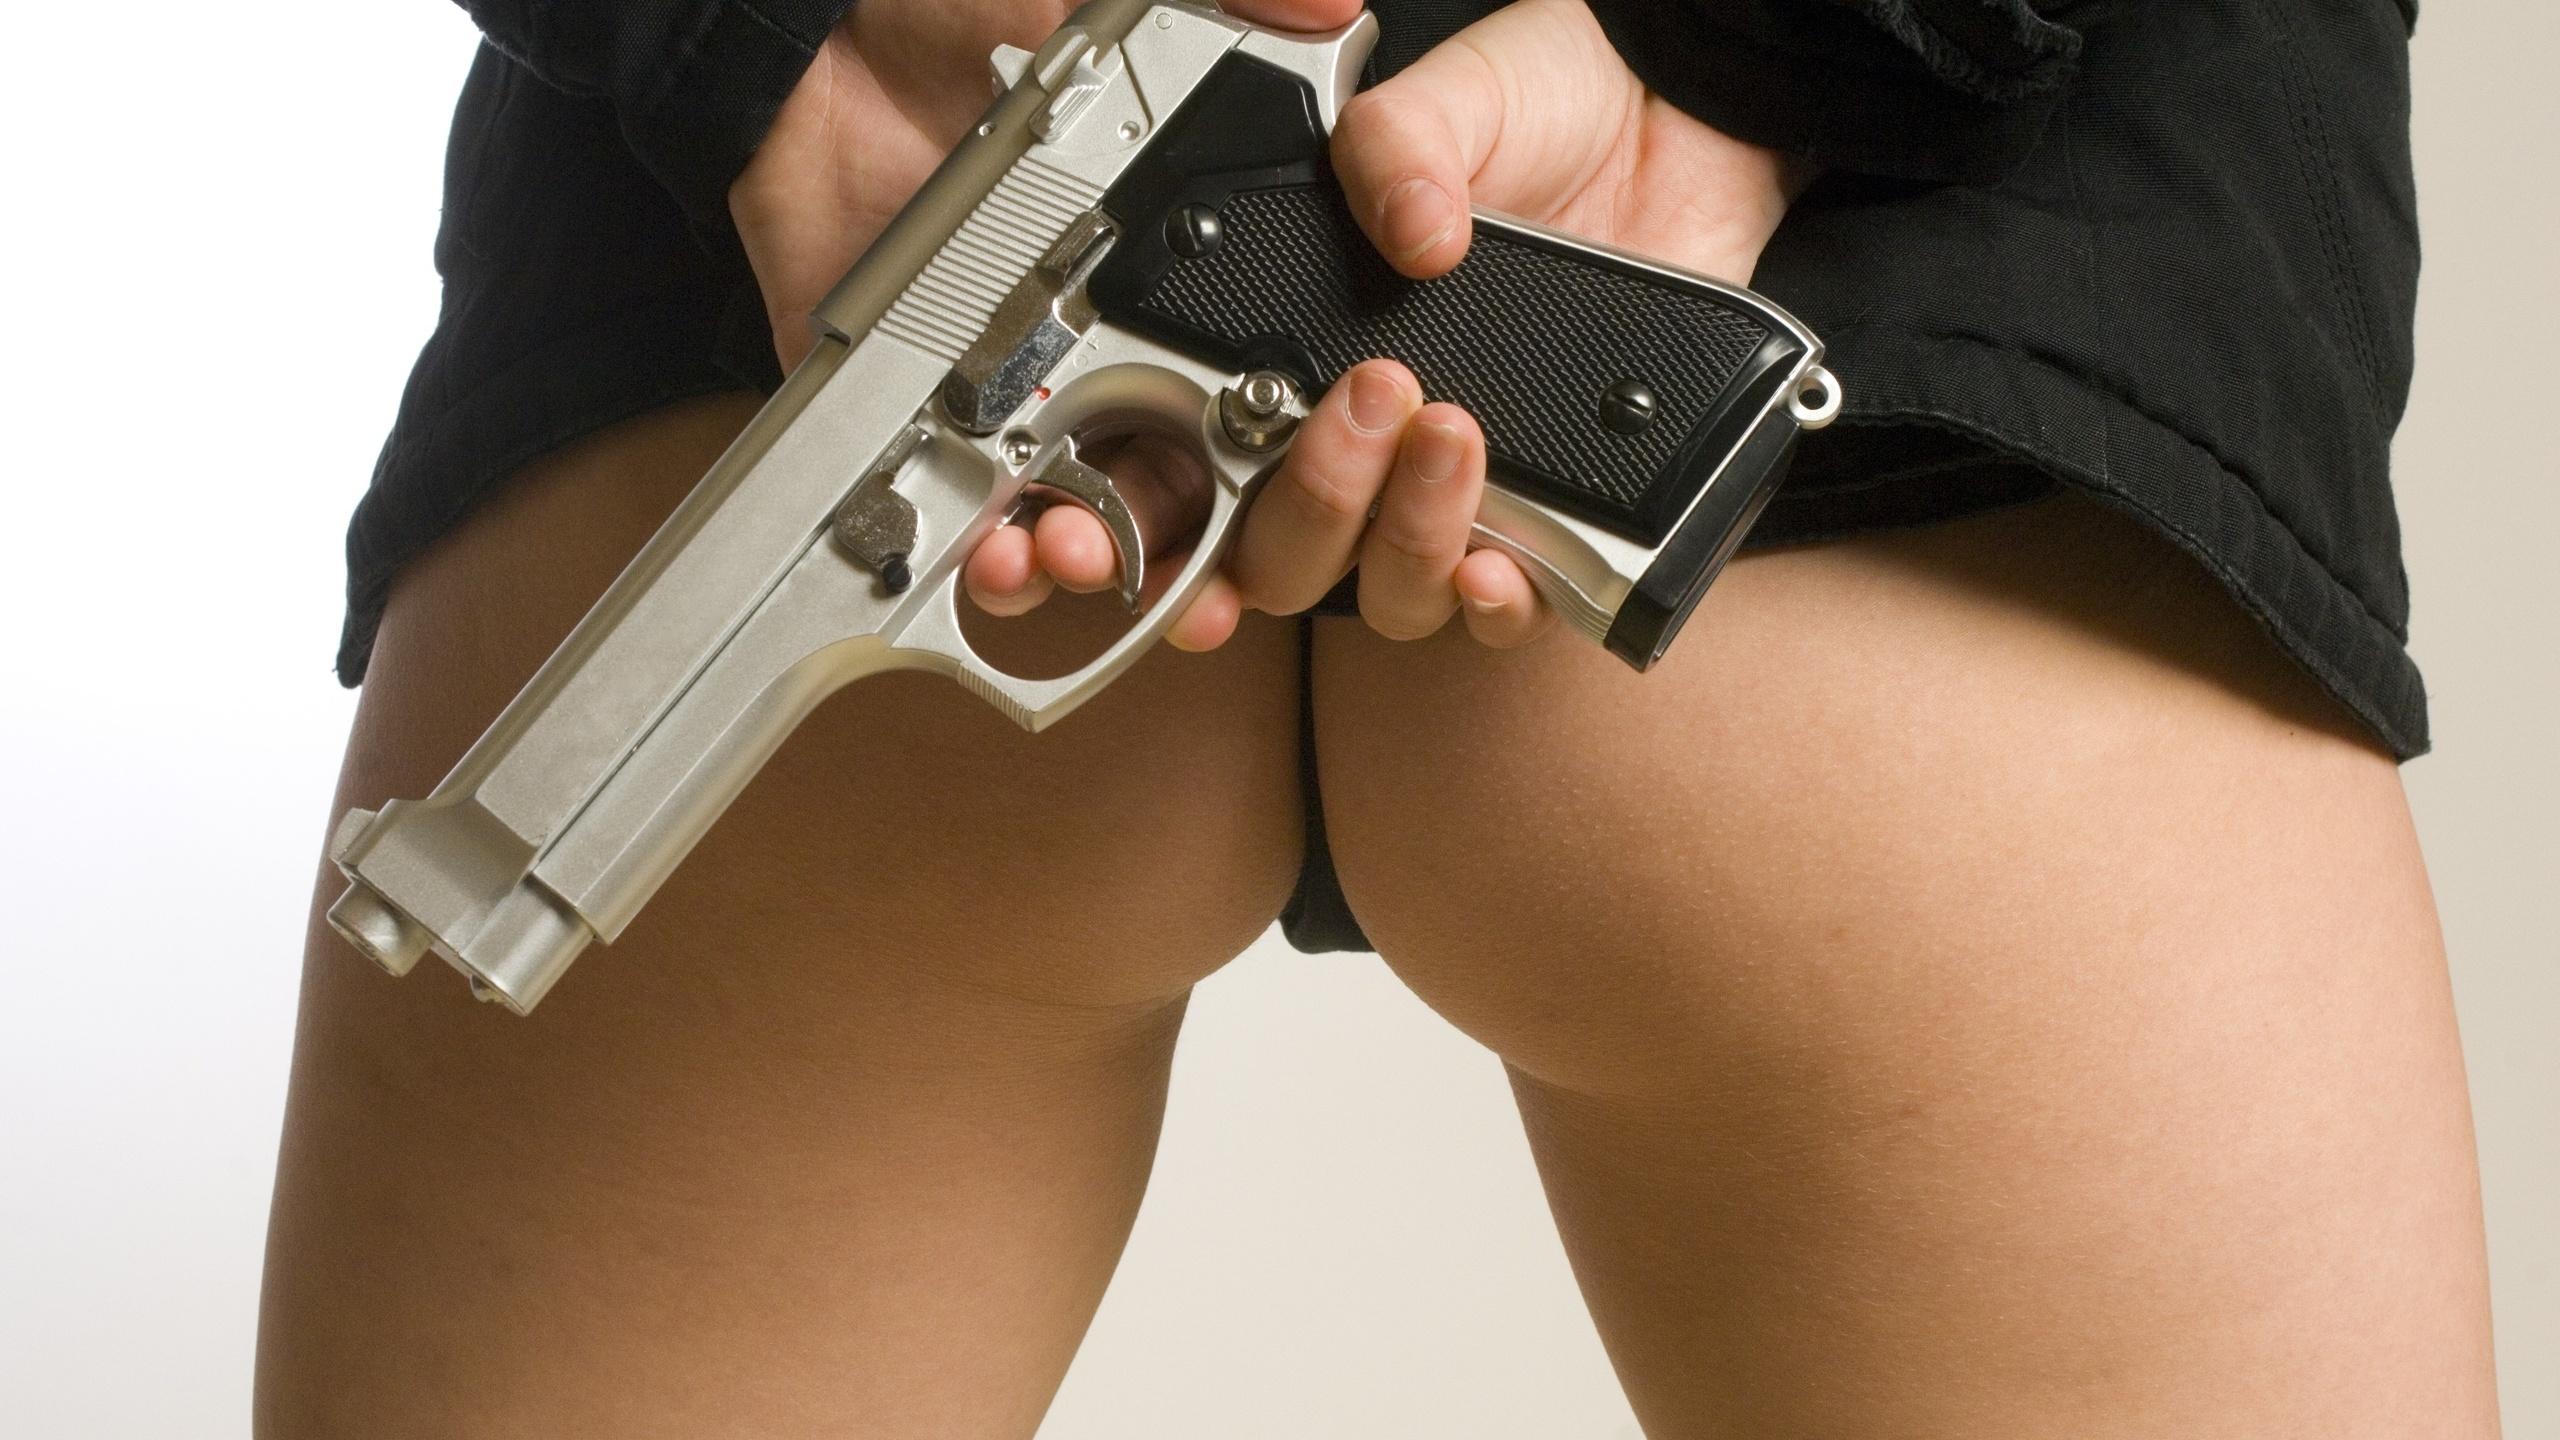 soset-pod-dulom-pistoleta